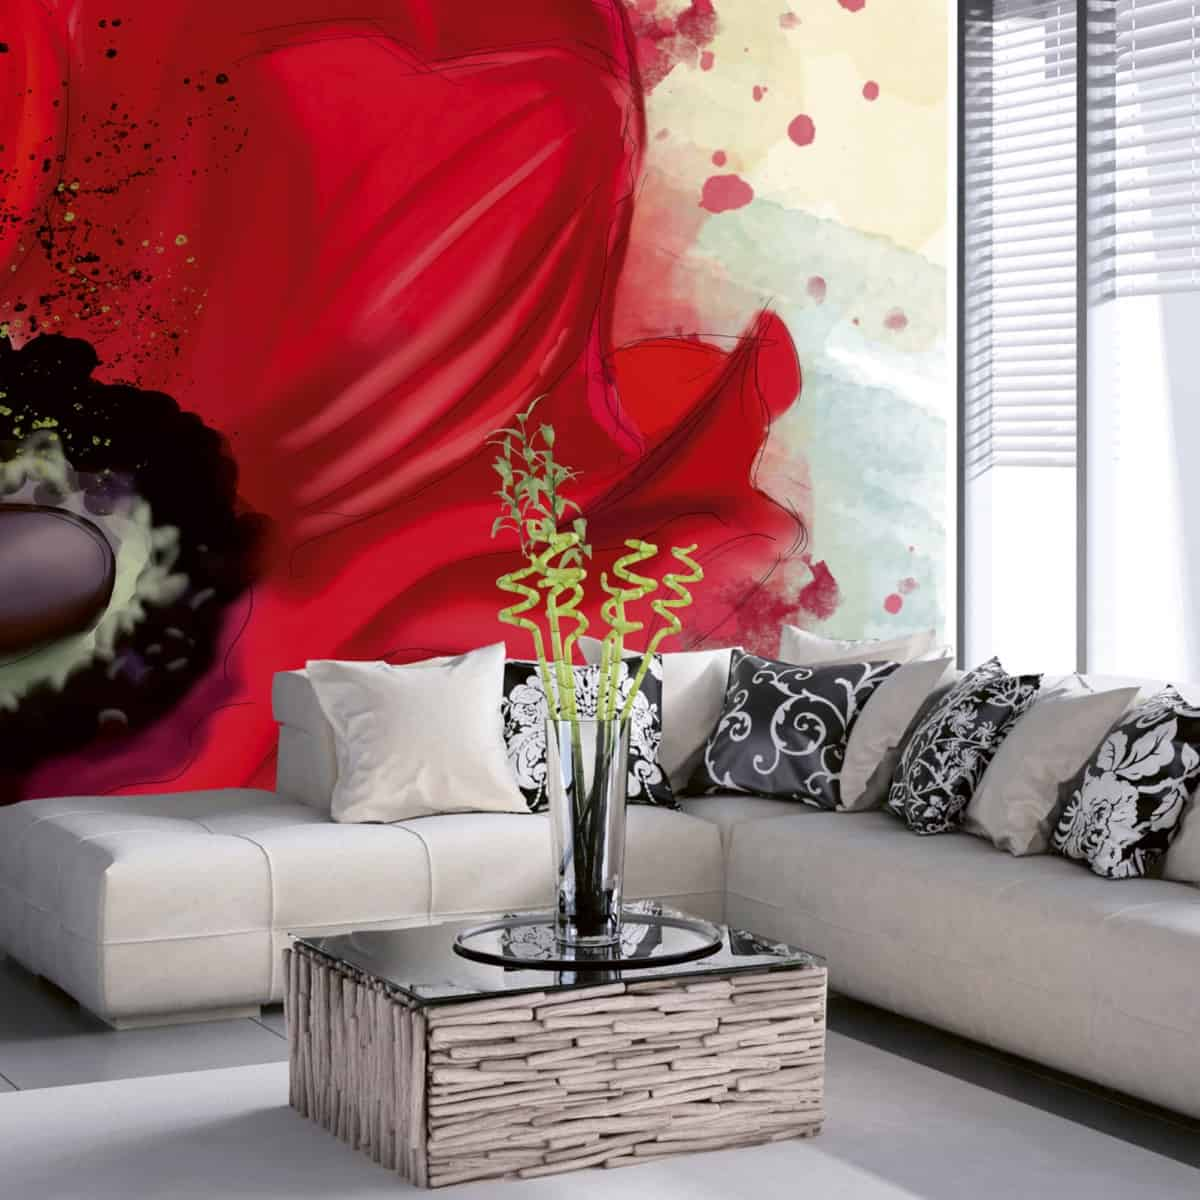 montare fototapet 3d cu motiv floral abstract predominant rosu intr-un living decorat in tonuri de alb, maro, verde, negru si gri, cu fereastra mare